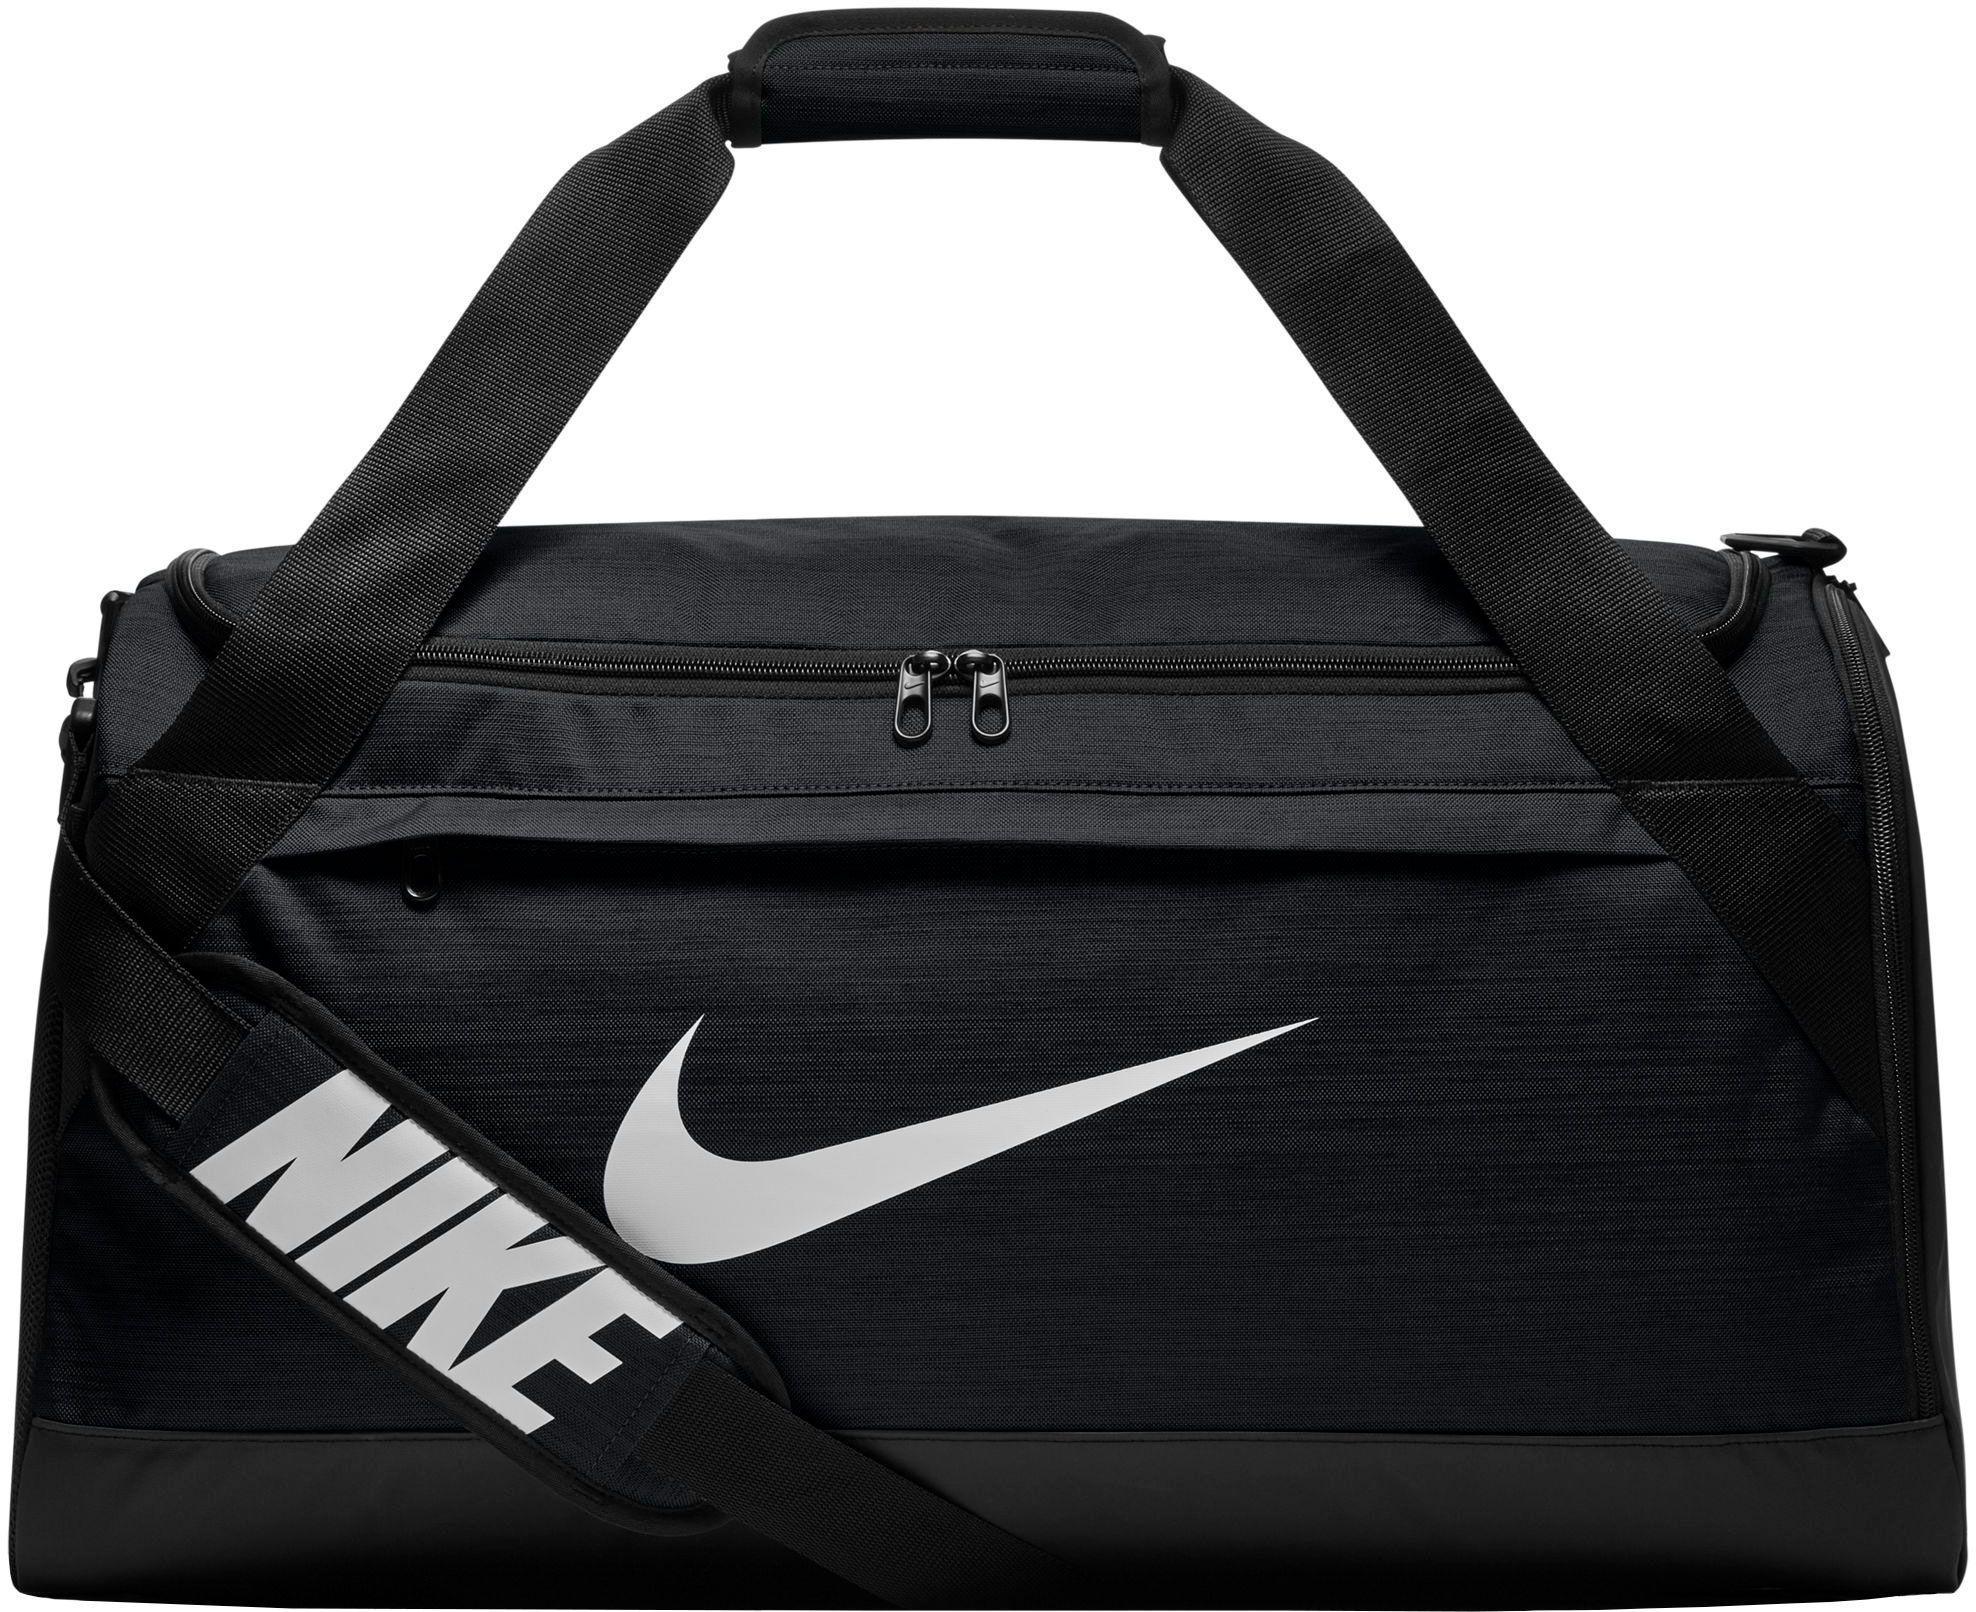 Lyst - Nike Rasilia Medium Training Duffle Bag in Black for Men 0e8ed7ef42fc1